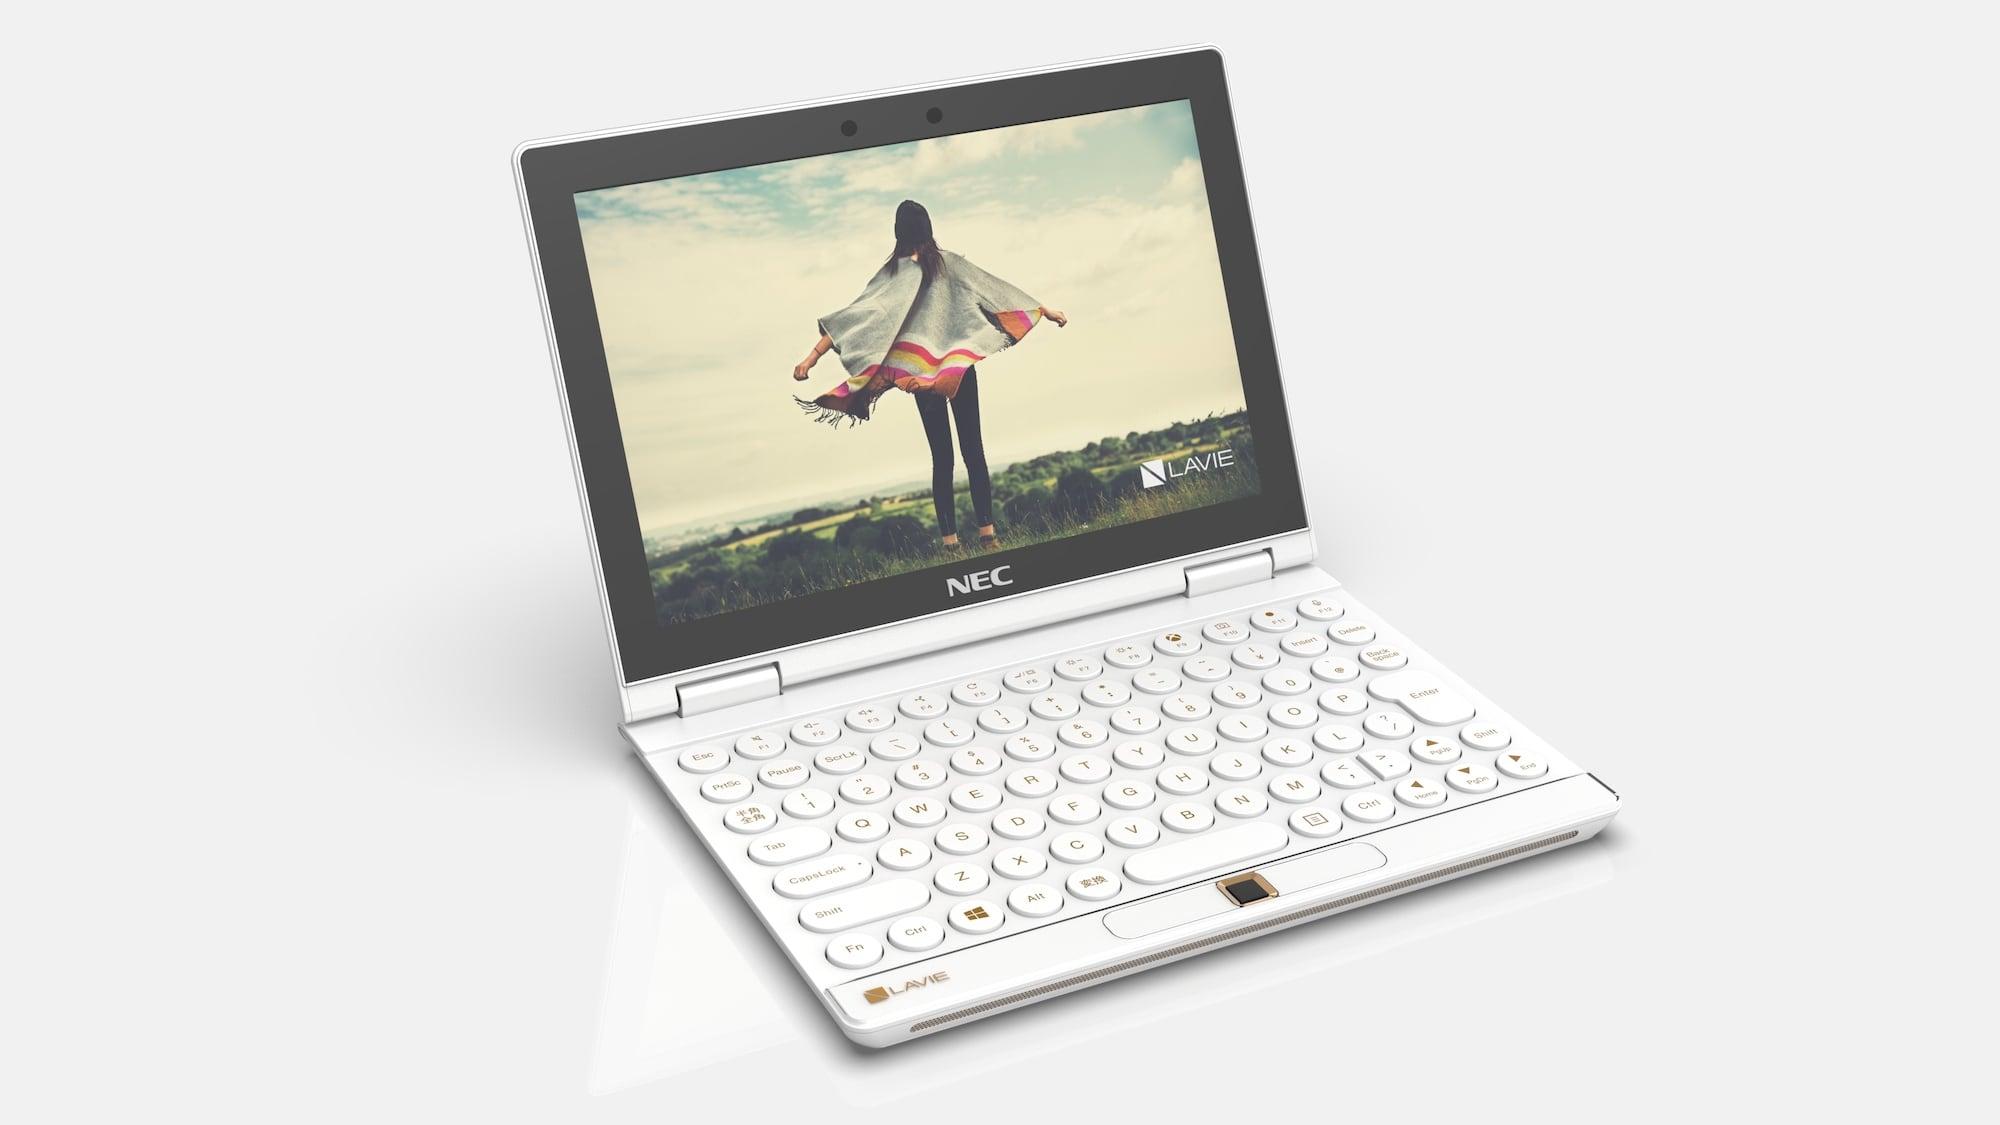 Lenovo LAVIE MINI convertible PC has an eight-inch WUXGA touch display